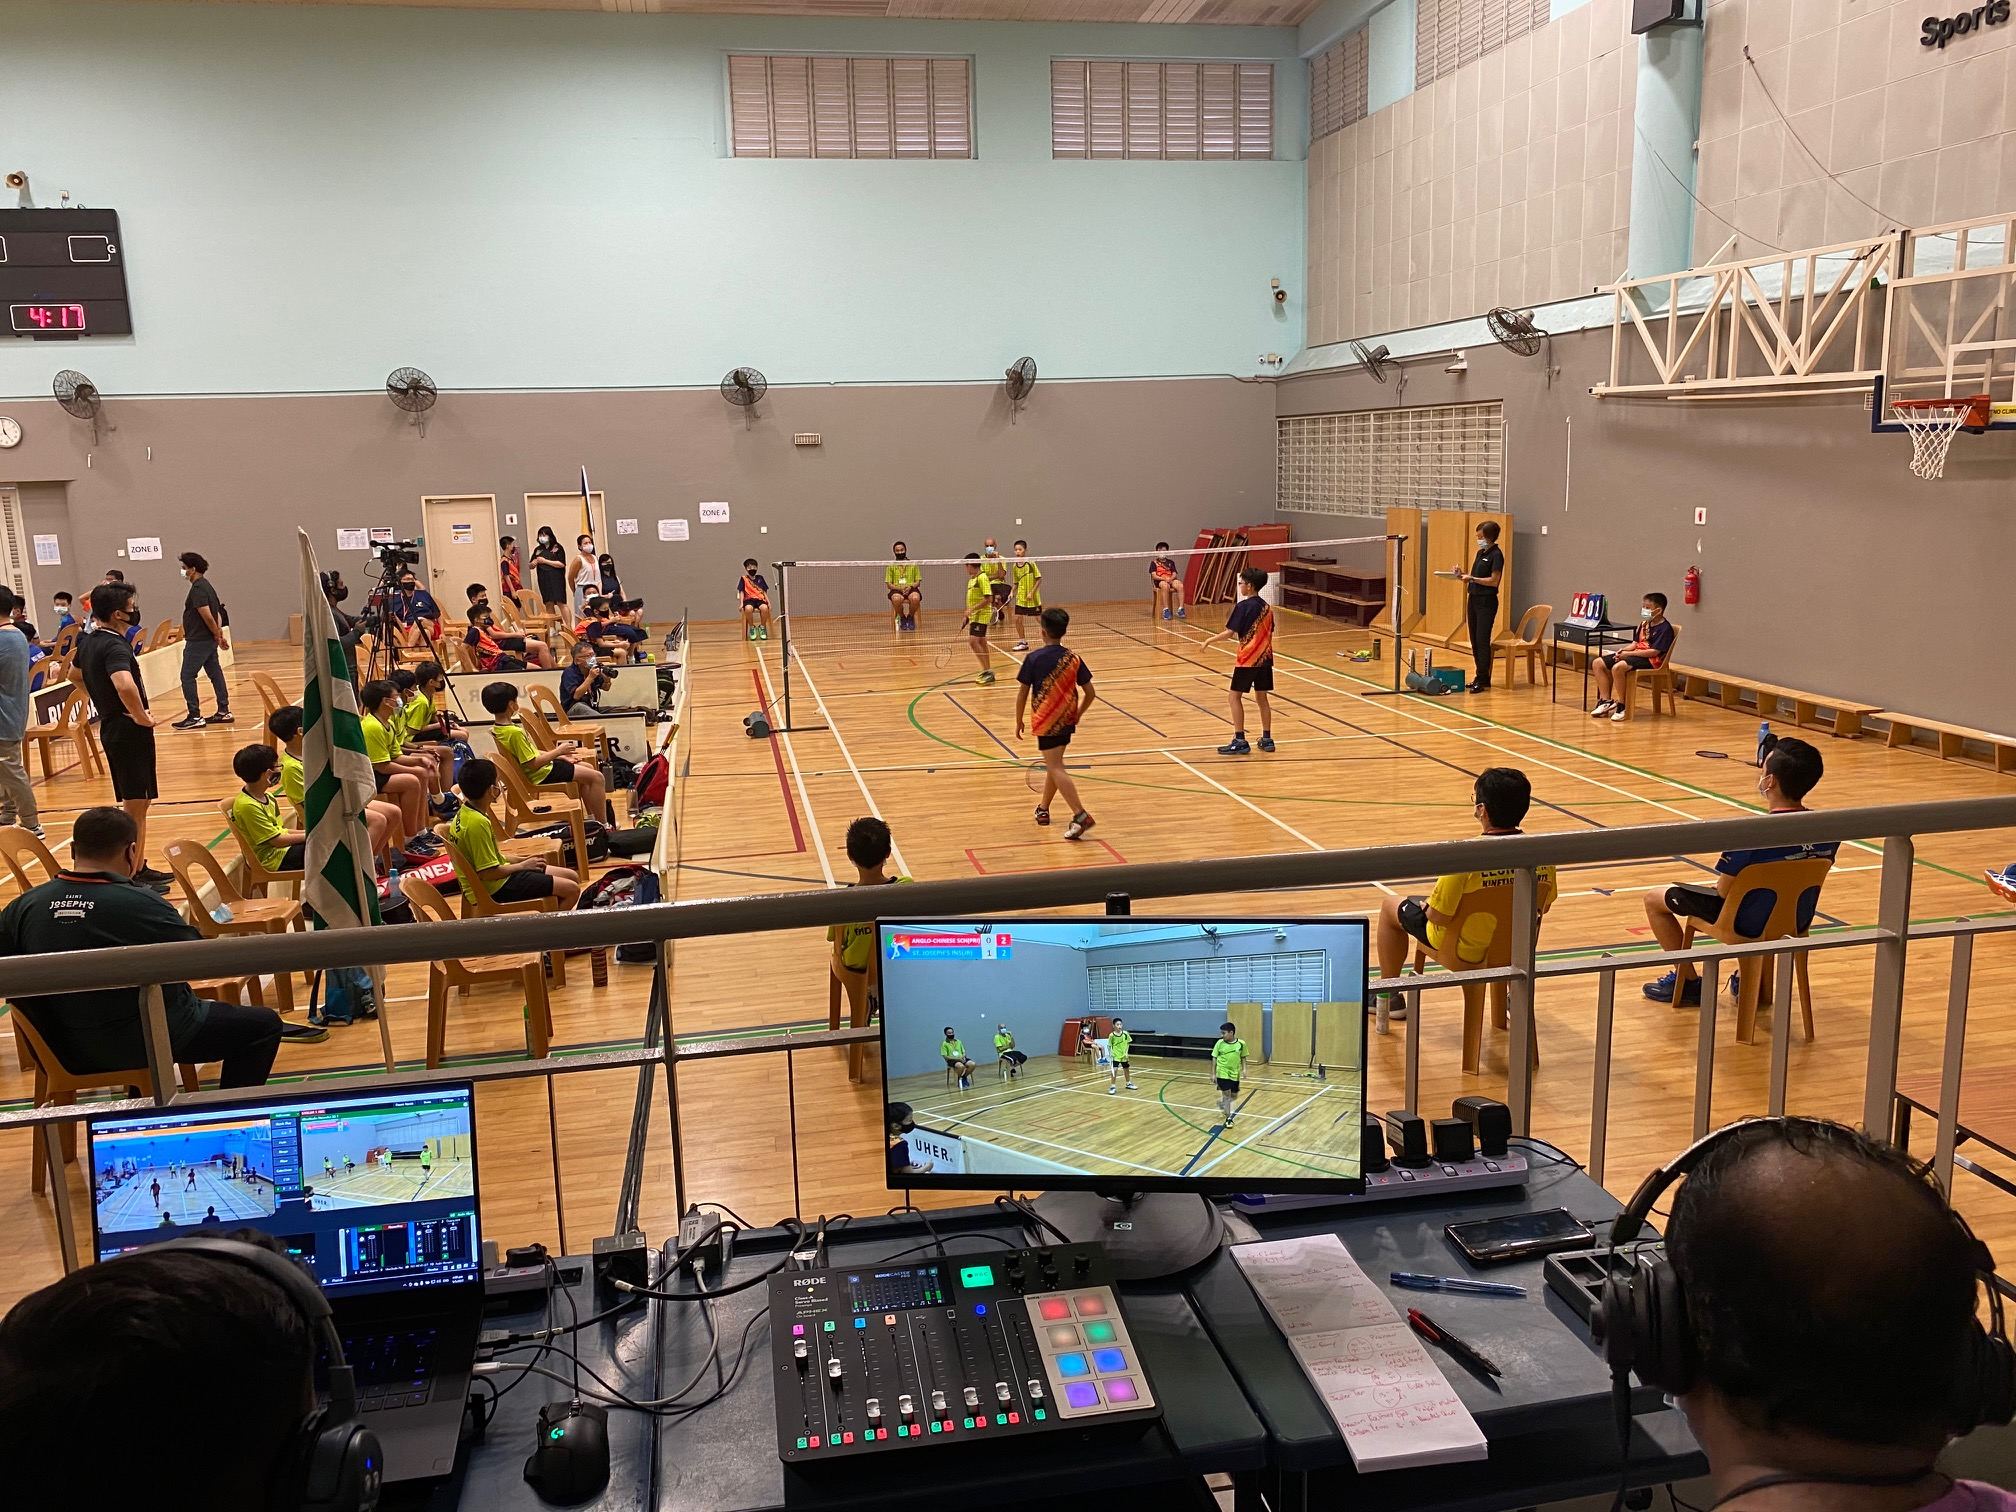 NSG Snr Div South Zone boys' badminton_ SJI Junior (green) vs ACS Primary (orange) 4